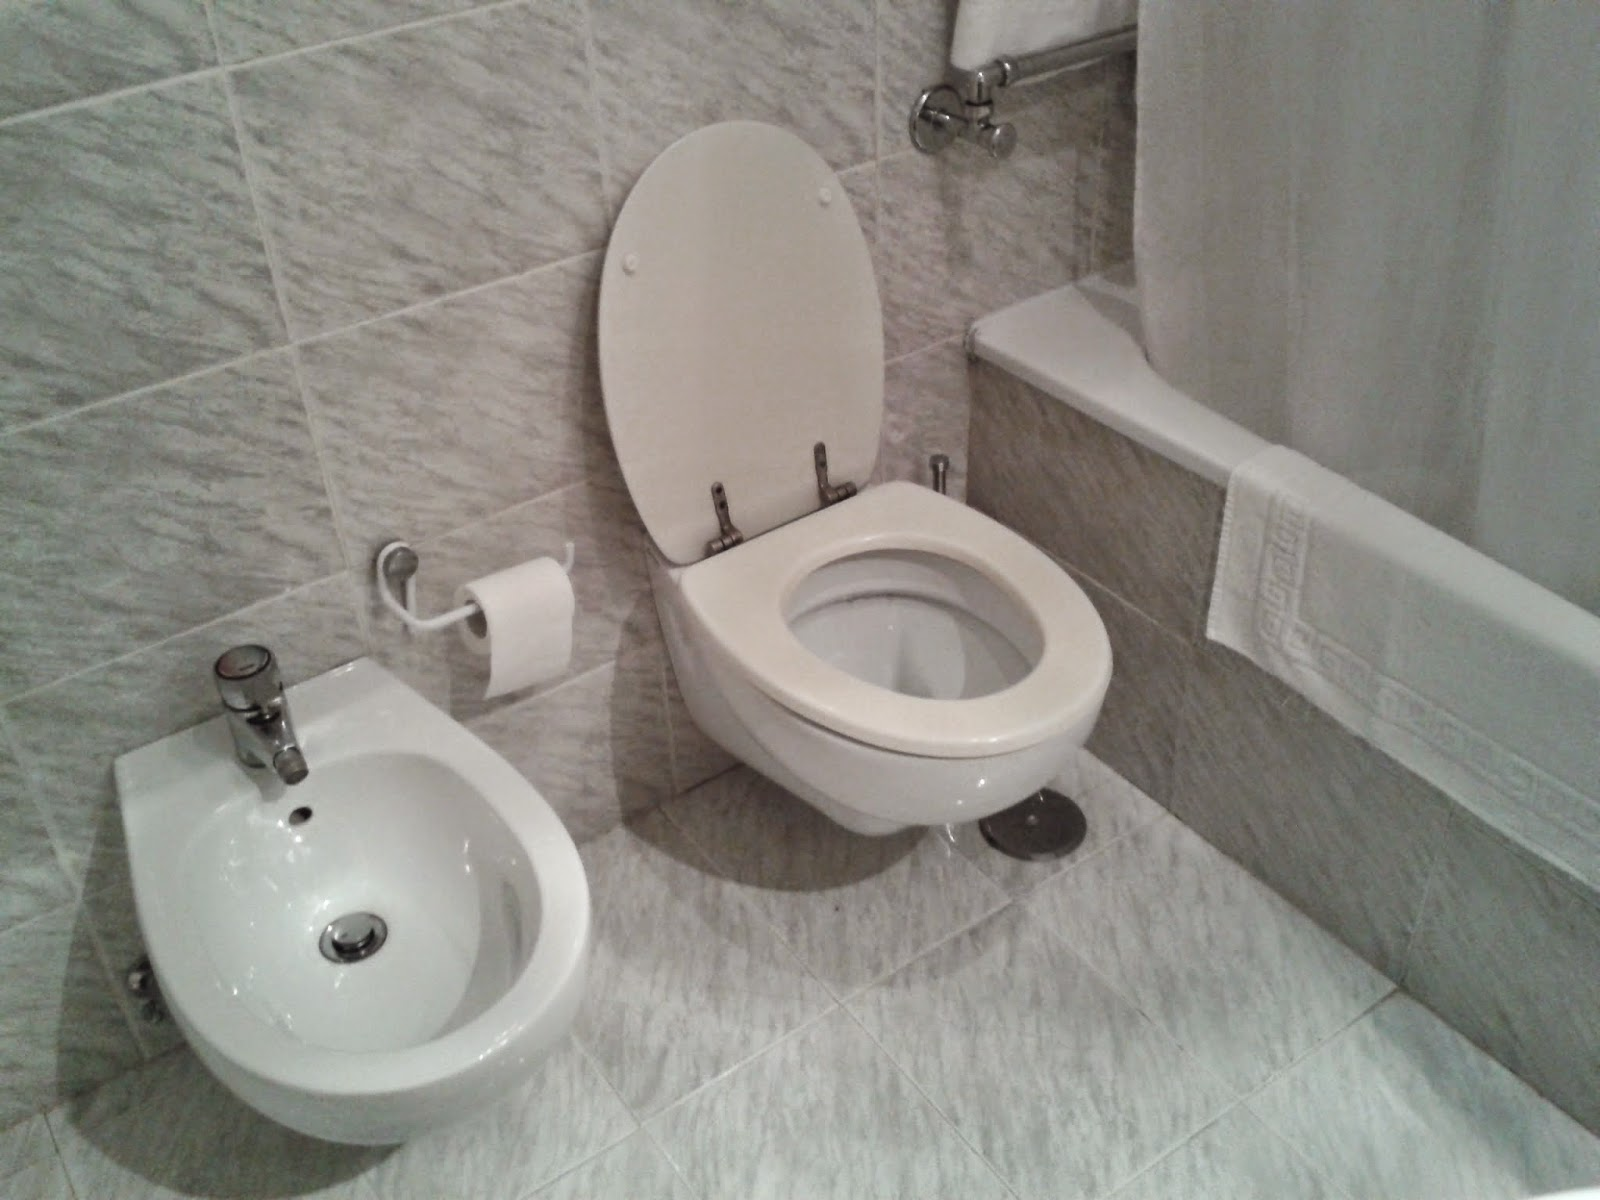 Bagno Chimico Dwg: Marmi per bagno ~ duylinh for .. Mobili bagno ...